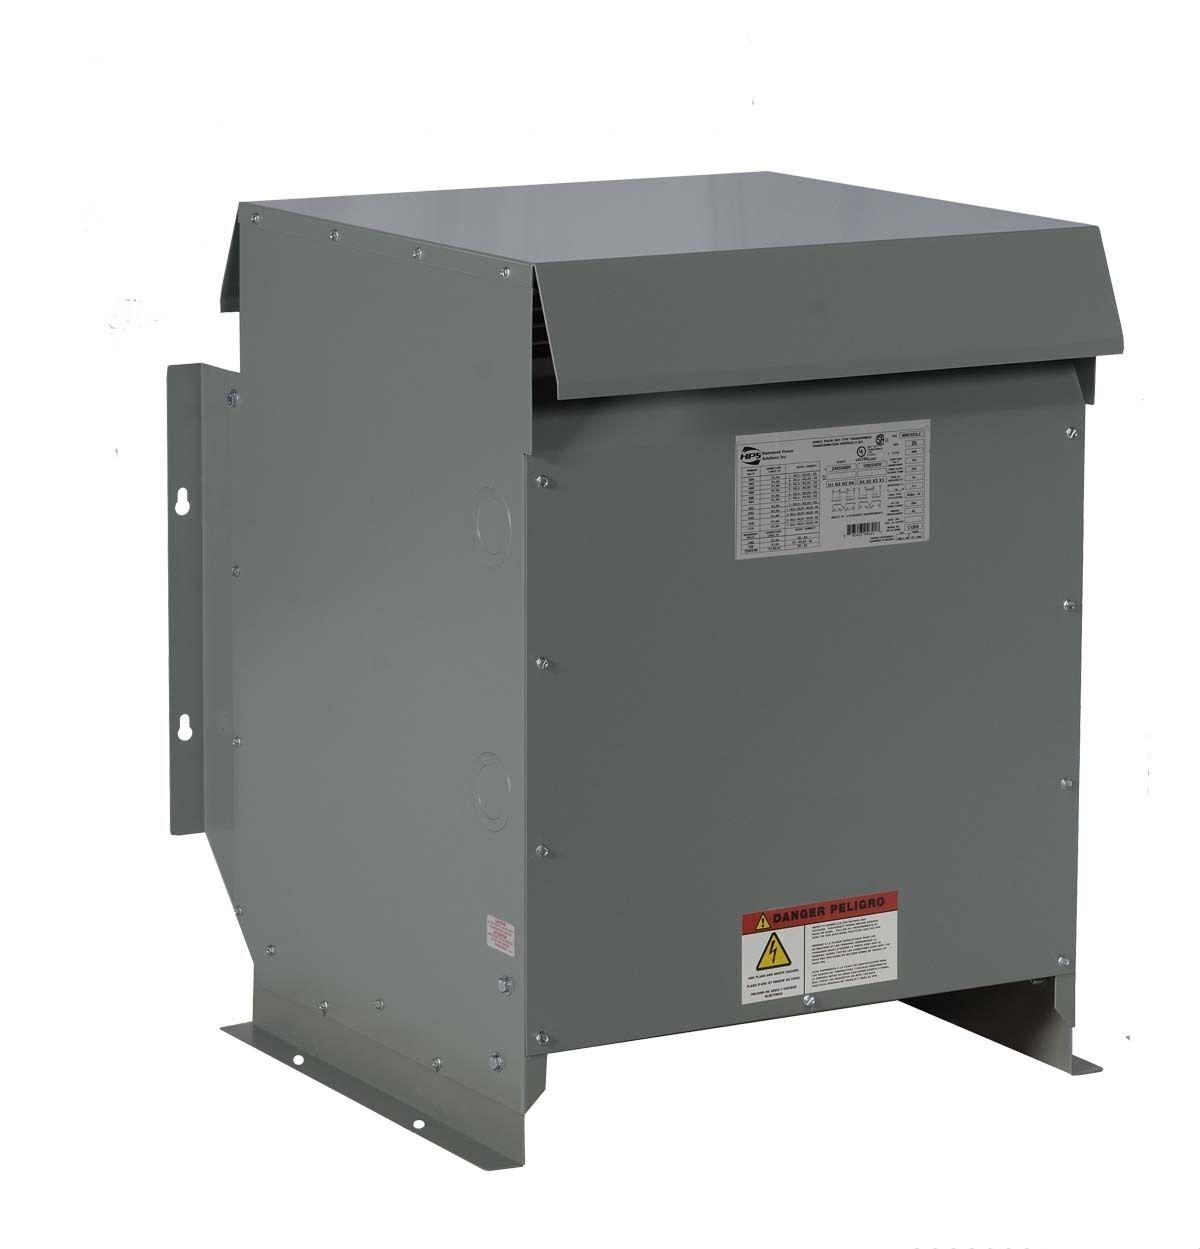 45kVA Dry Type Transformer 480 - 240 Volt, 3 Phase - New, NEMA 3R Enclosure